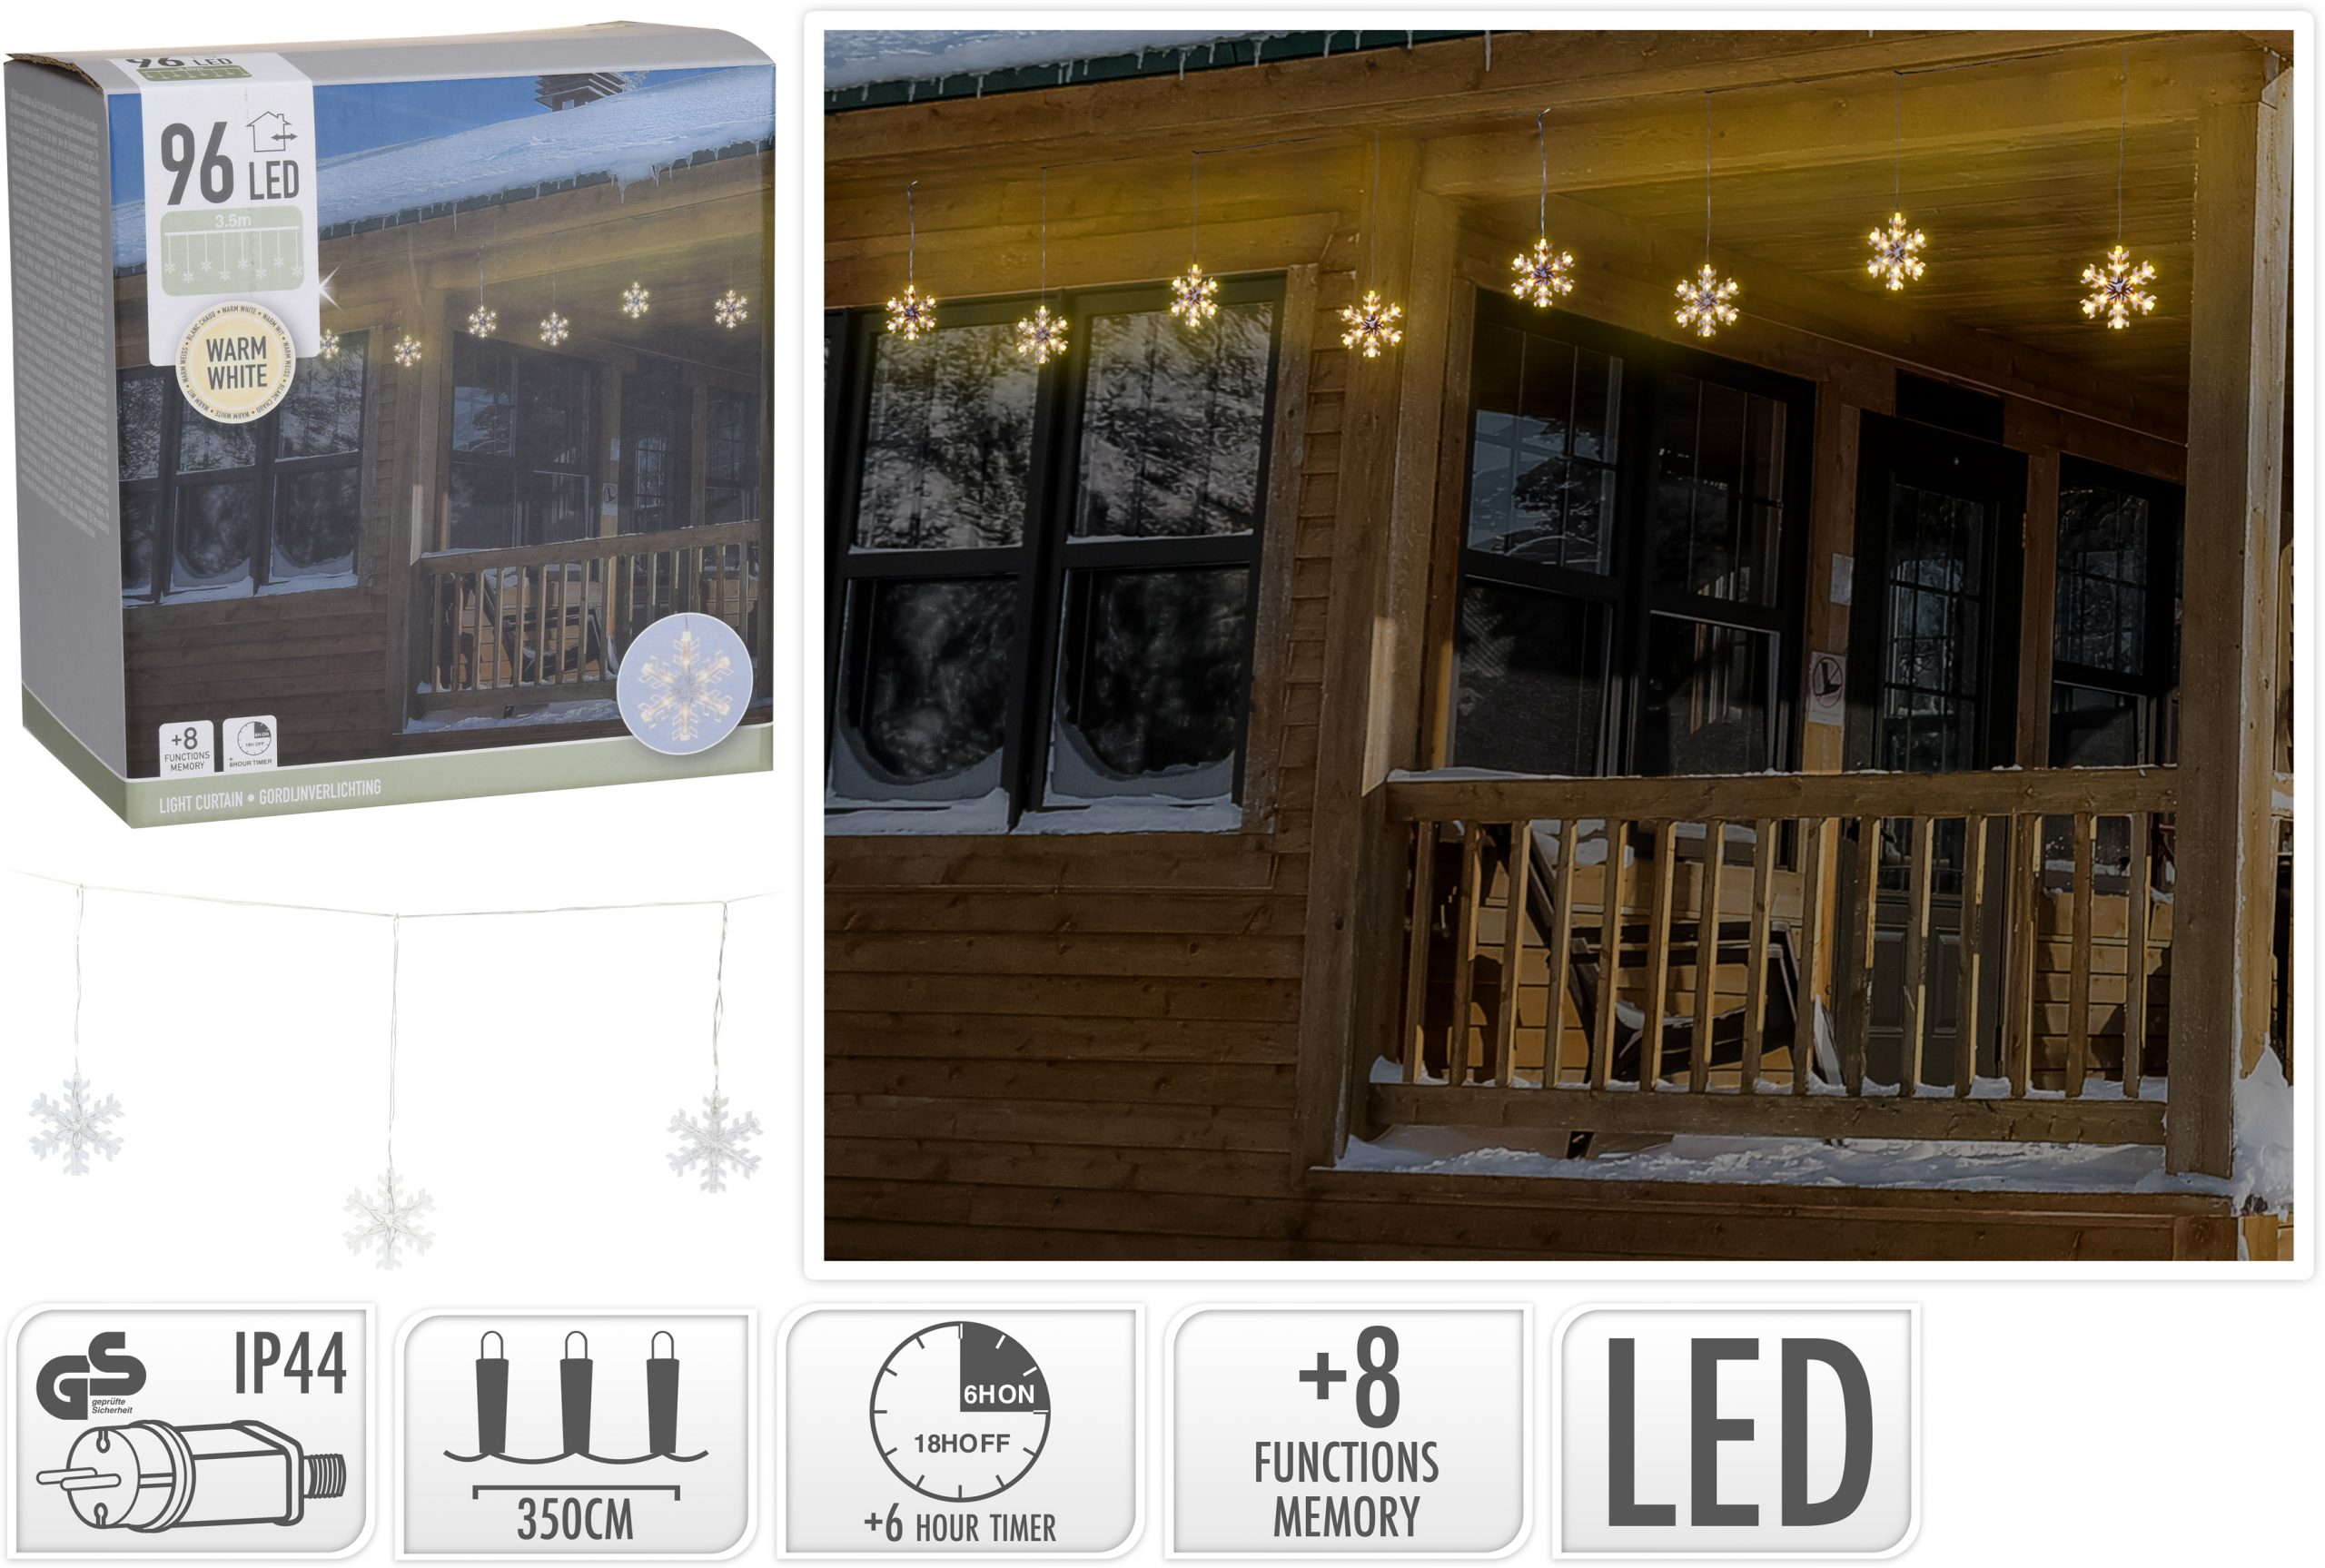 LED Beleuchtung Schneeflocke Image